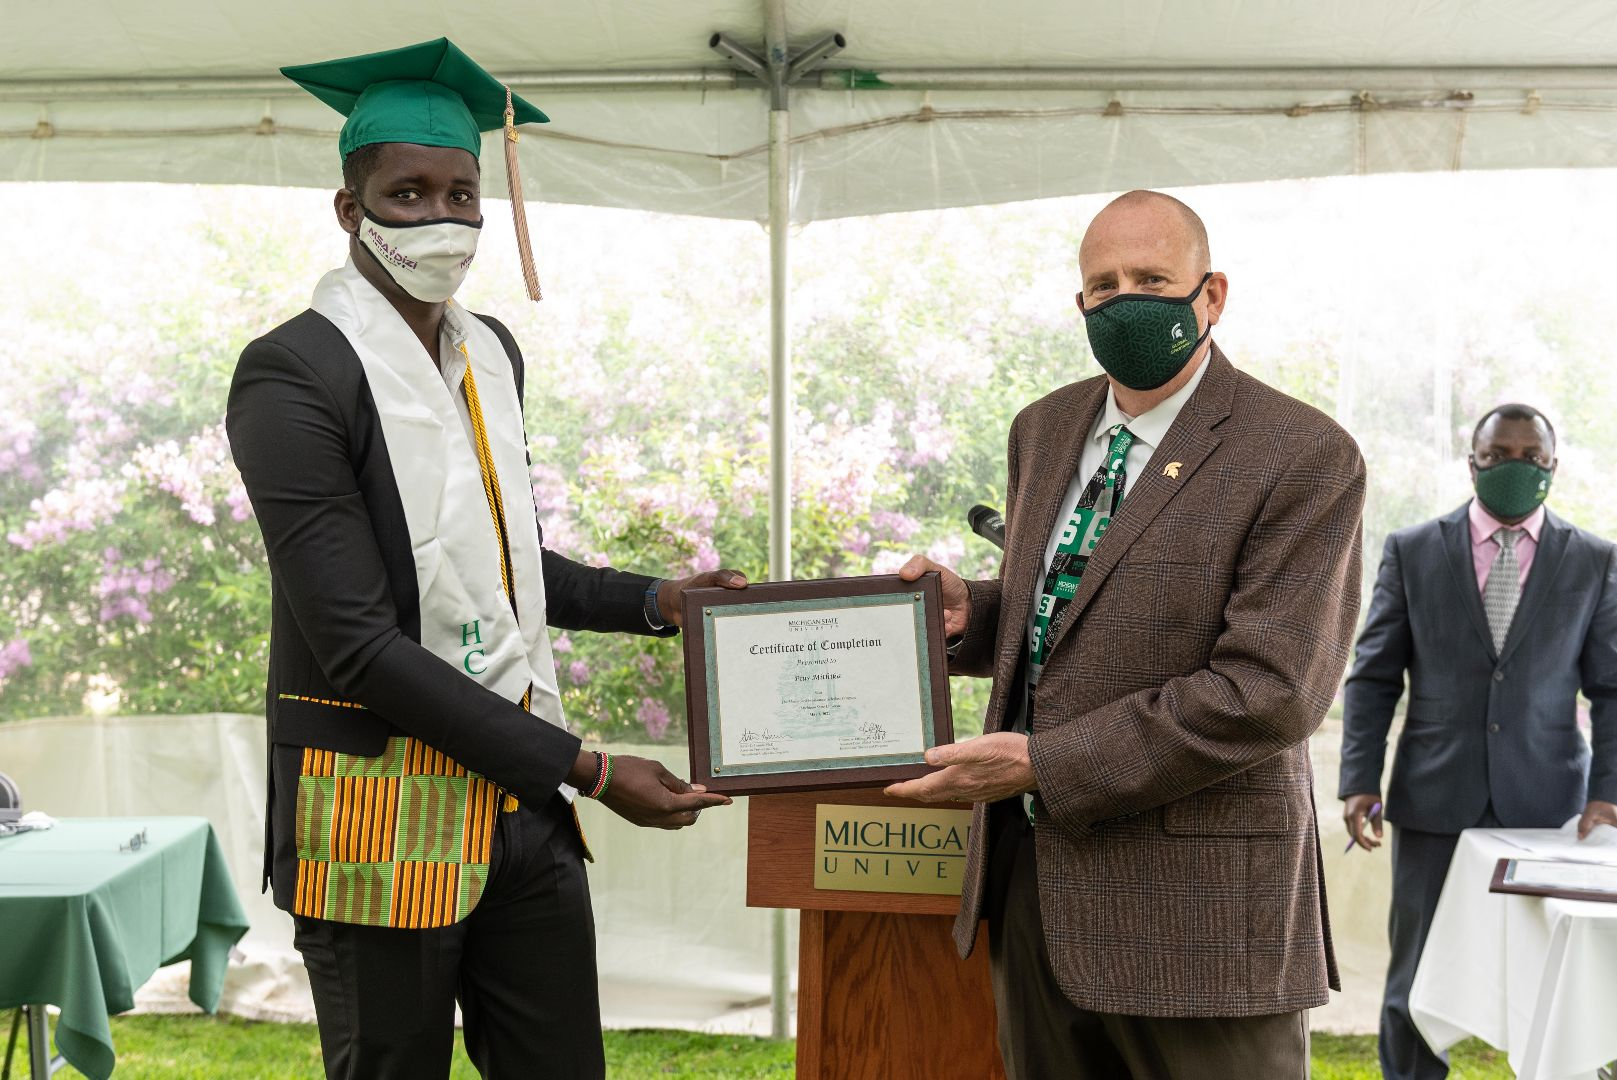 2021-msu-isp graduation-HI-RES-115.jpg